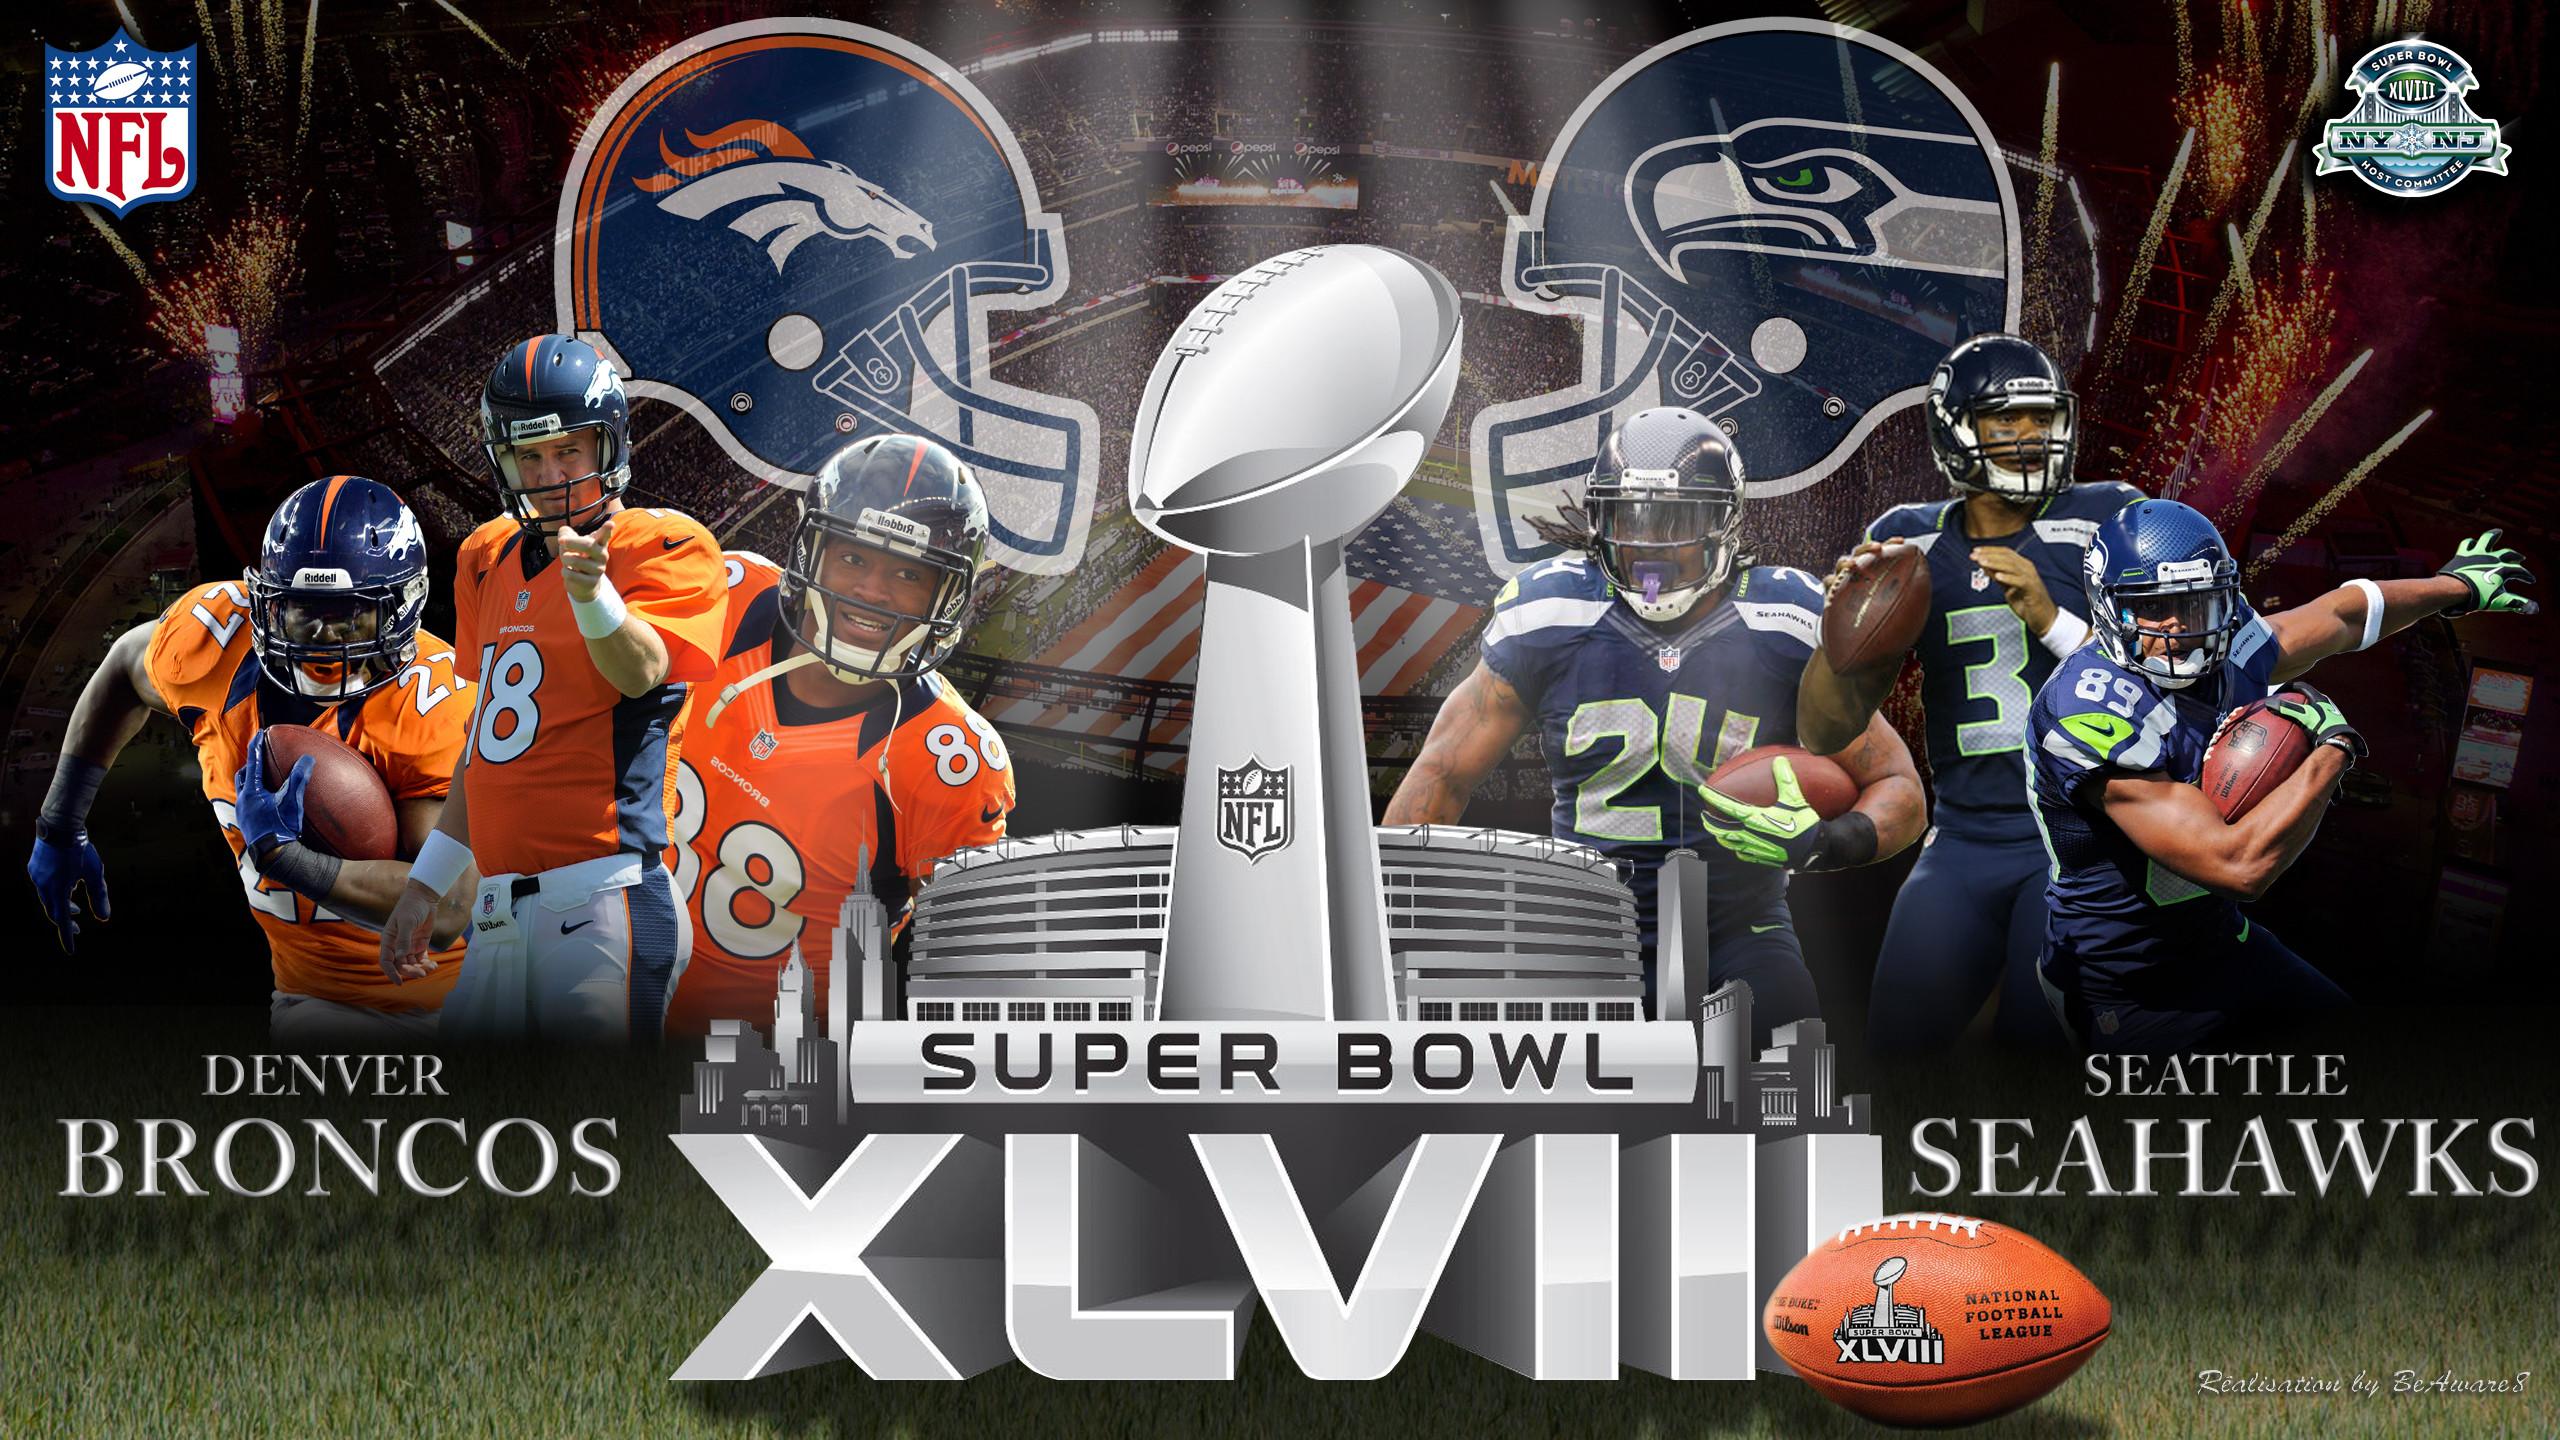 Super Bowl XLVIII Denver Broncos Vs Seattle Seahaw by BeAware8 on .